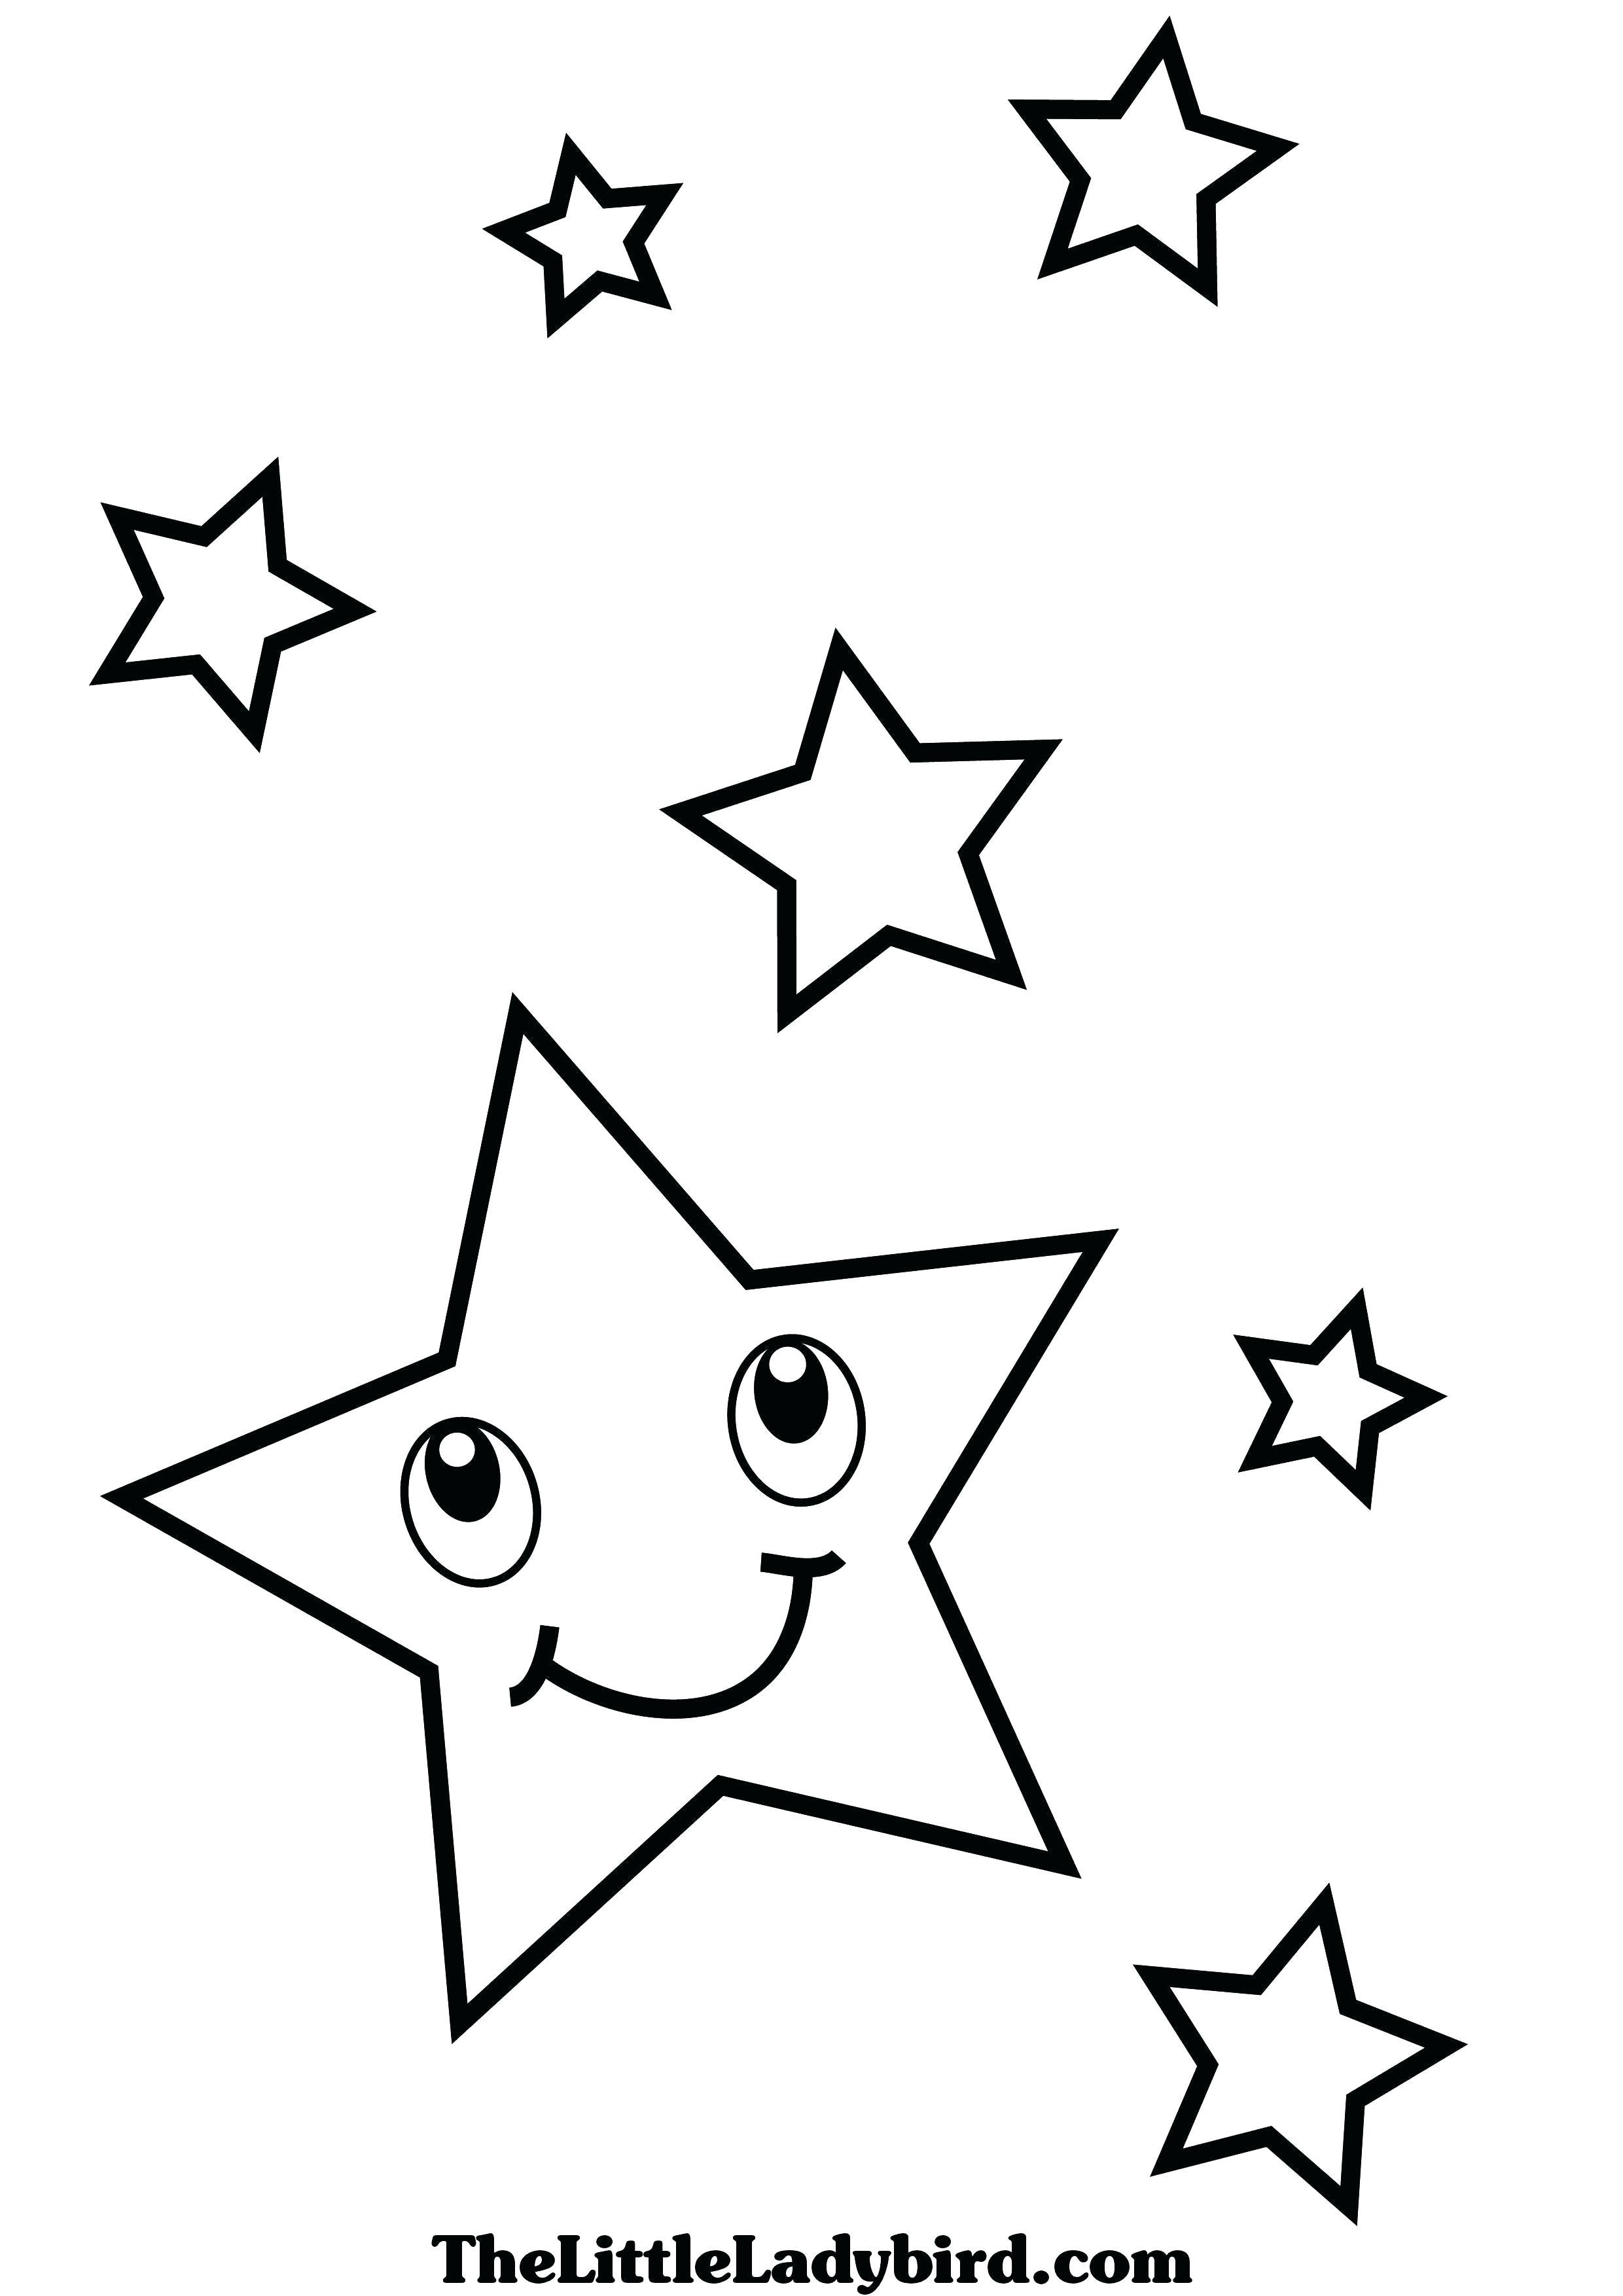 2480x3508 New Printable Shooting Star Coloring Pages Printable